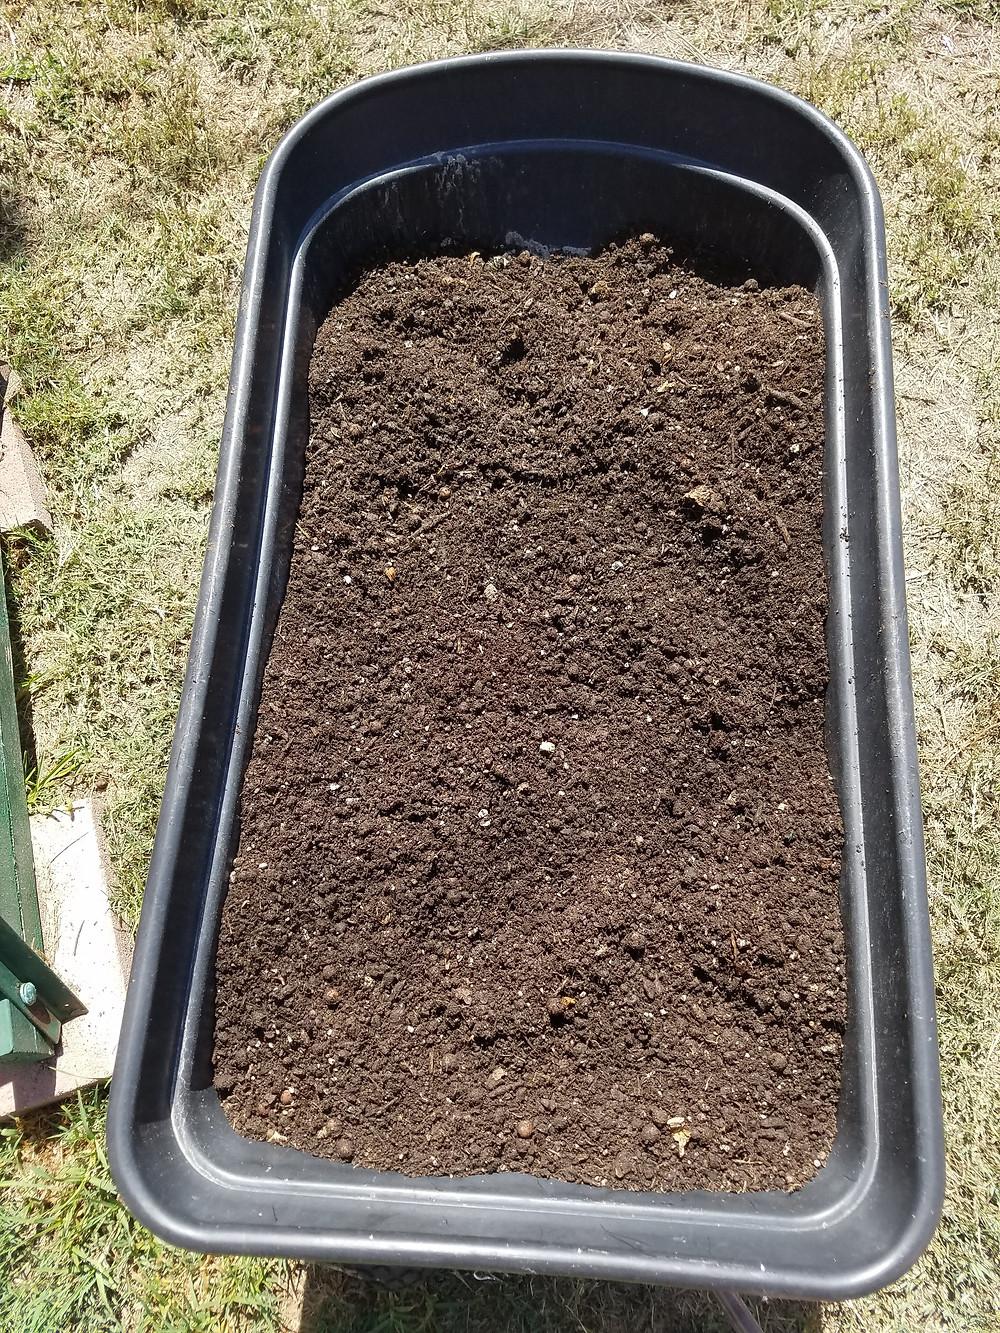 Composting make terrific natural fertilizer